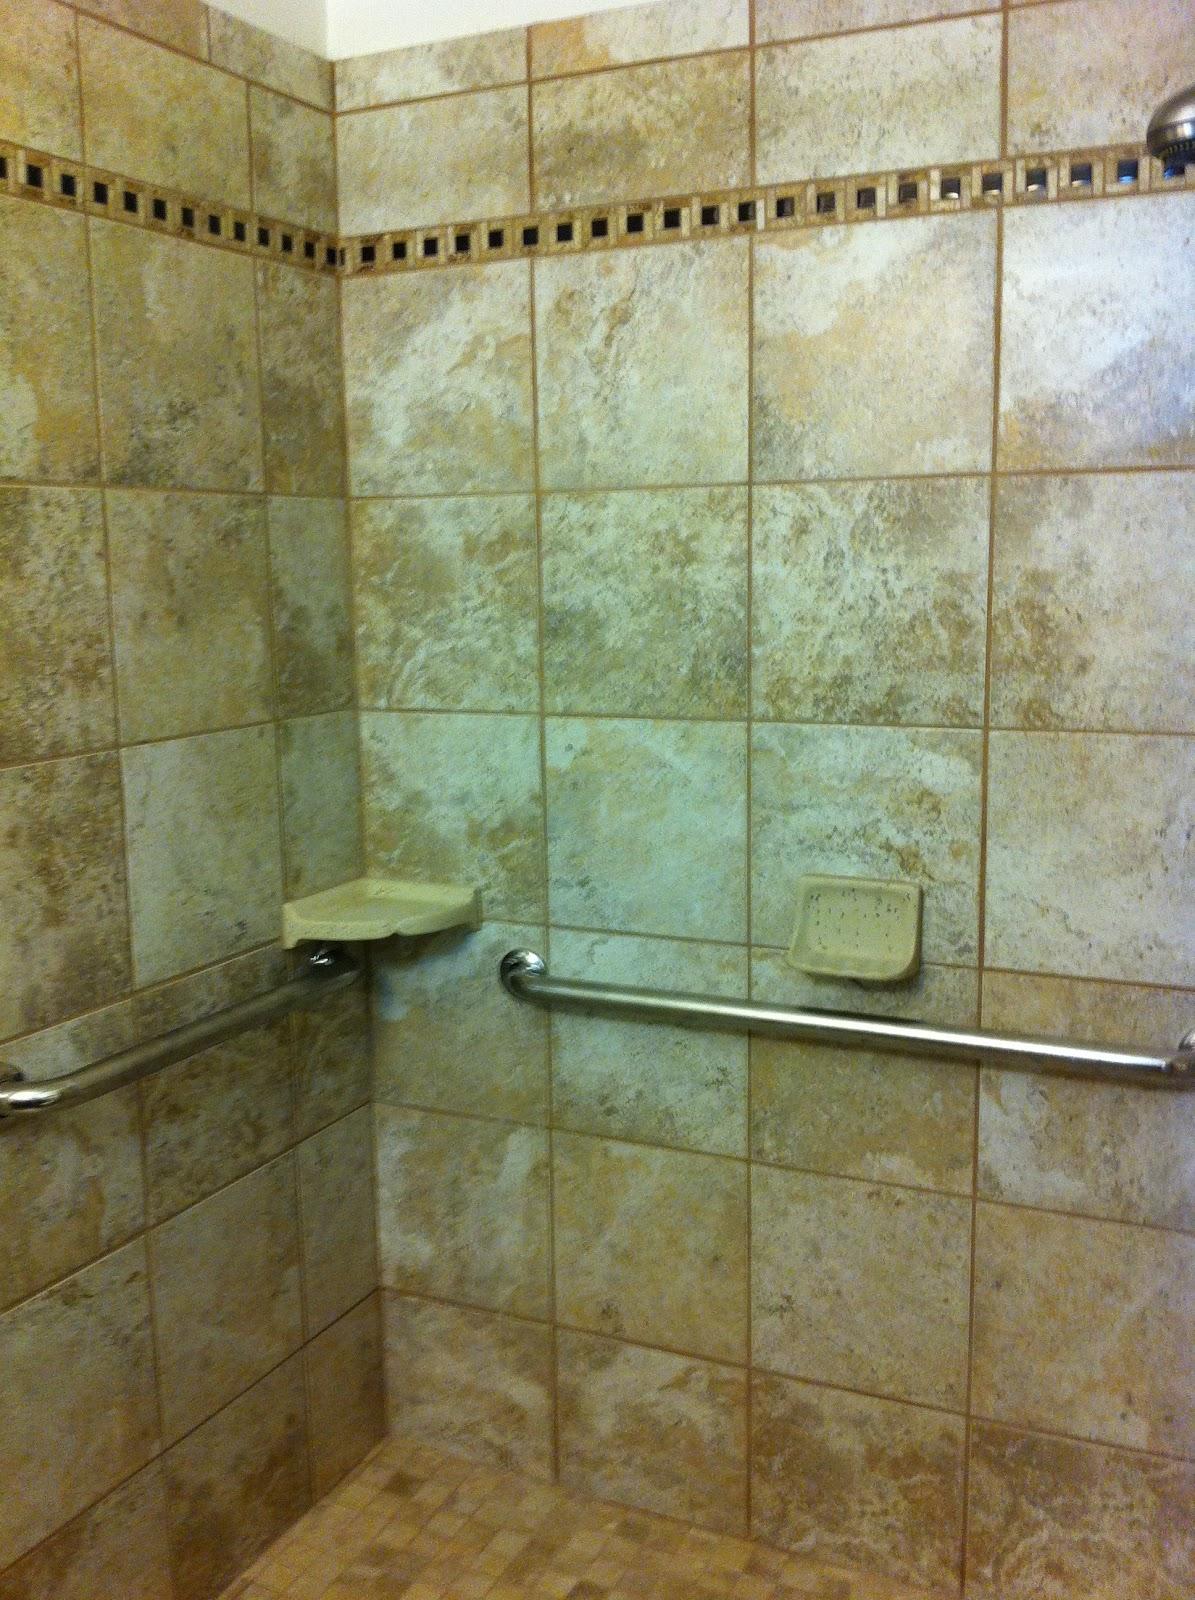 Shower Stall Grab Bars